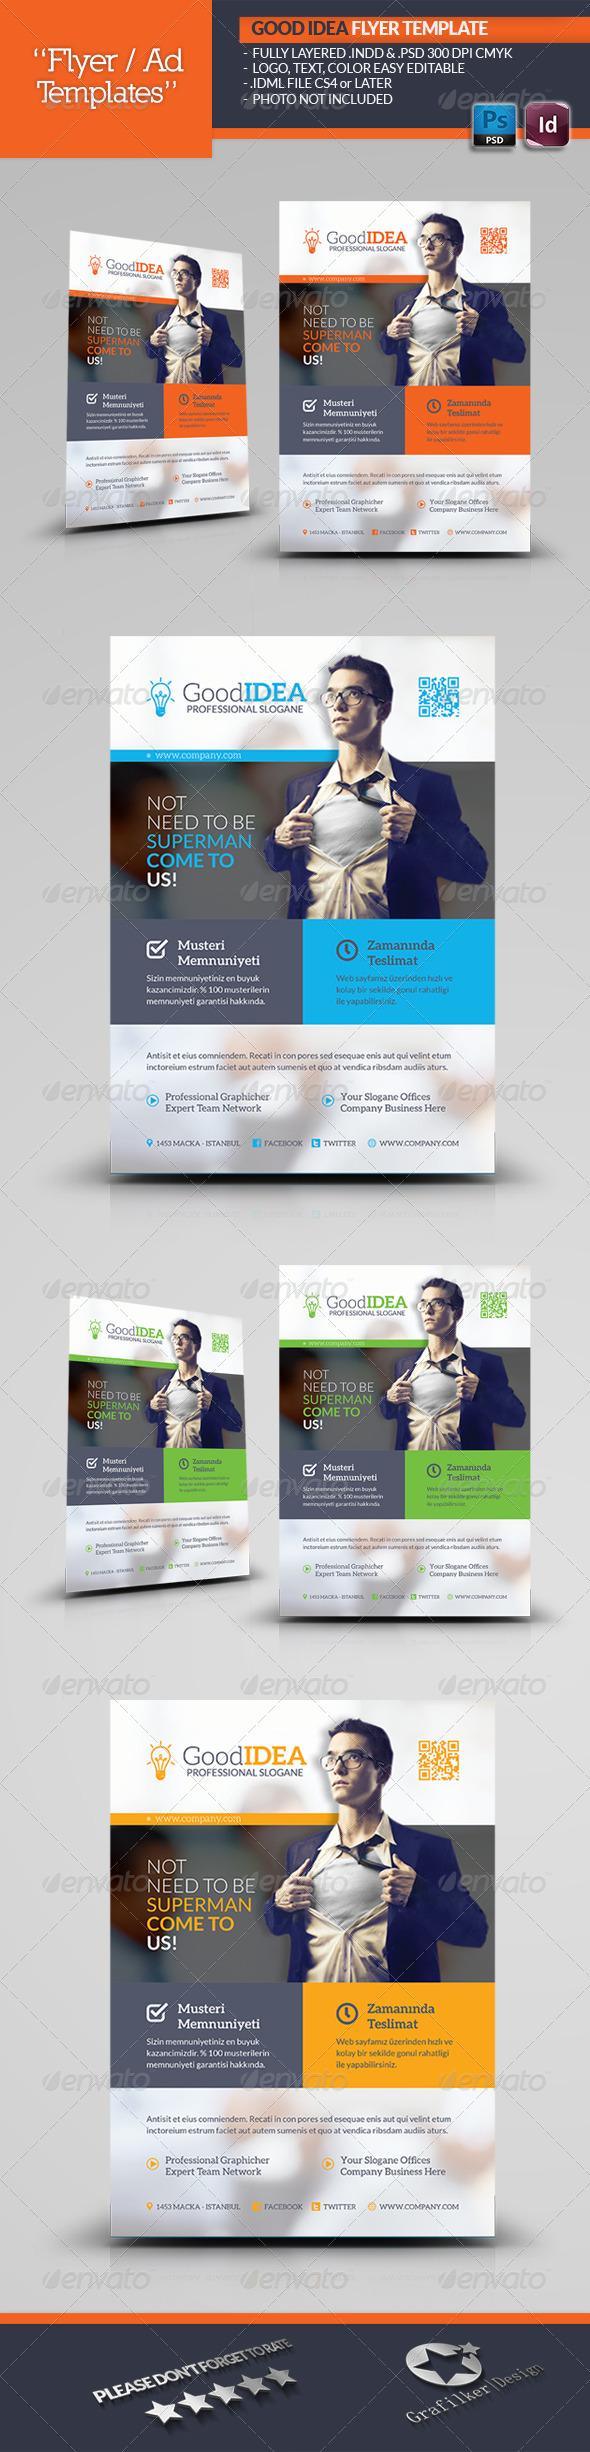 GraphicRiver Good Idea Flyer Template 5633829